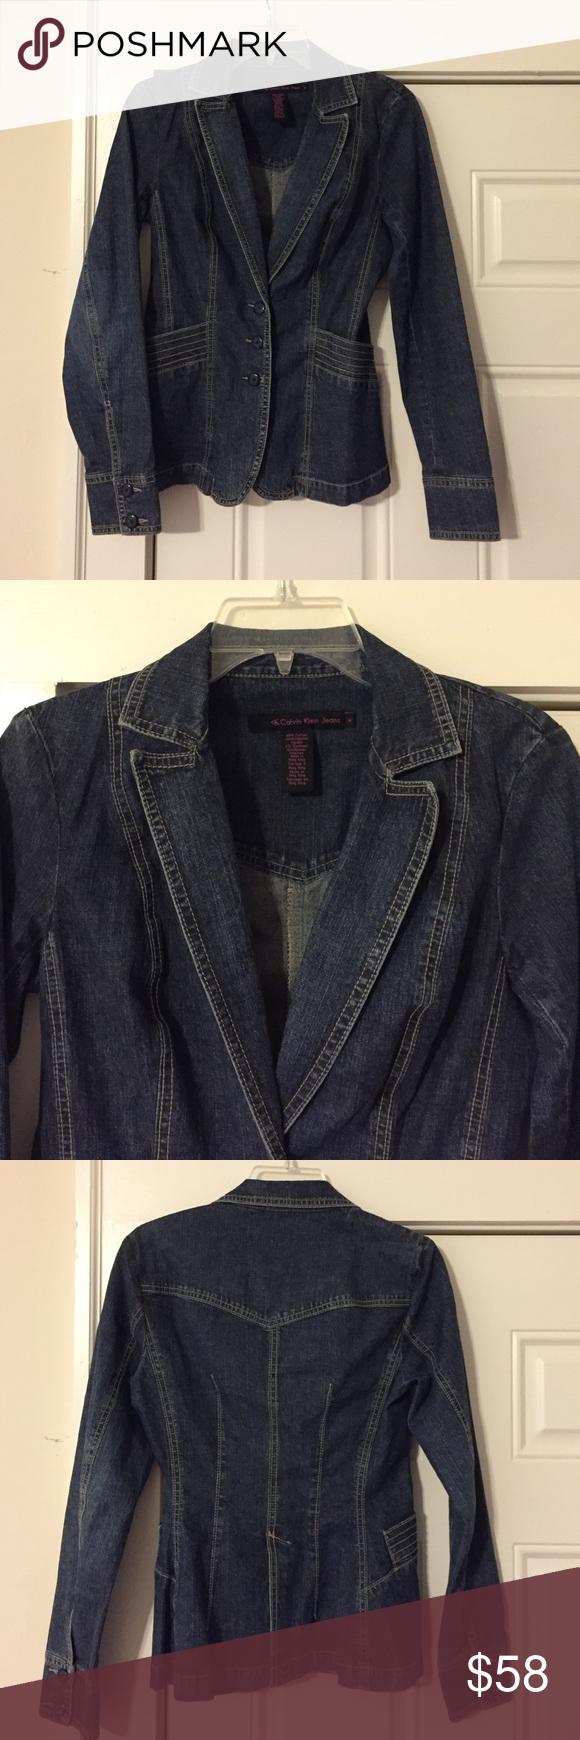 "Calvin Klein Denim Blazer Calvin Klein Jeans Denim Blazer, upgraded jean jacket!! Size Medium. No signs of wear, it's just been hanging in my closet for years. Has 2 pockets on each side. 98% Cotton, 2% Elastane. 32"" bust, 15"" shoulder, 25.5"" length Calvin Klein Jeans Jackets & Coats Jean Jackets"